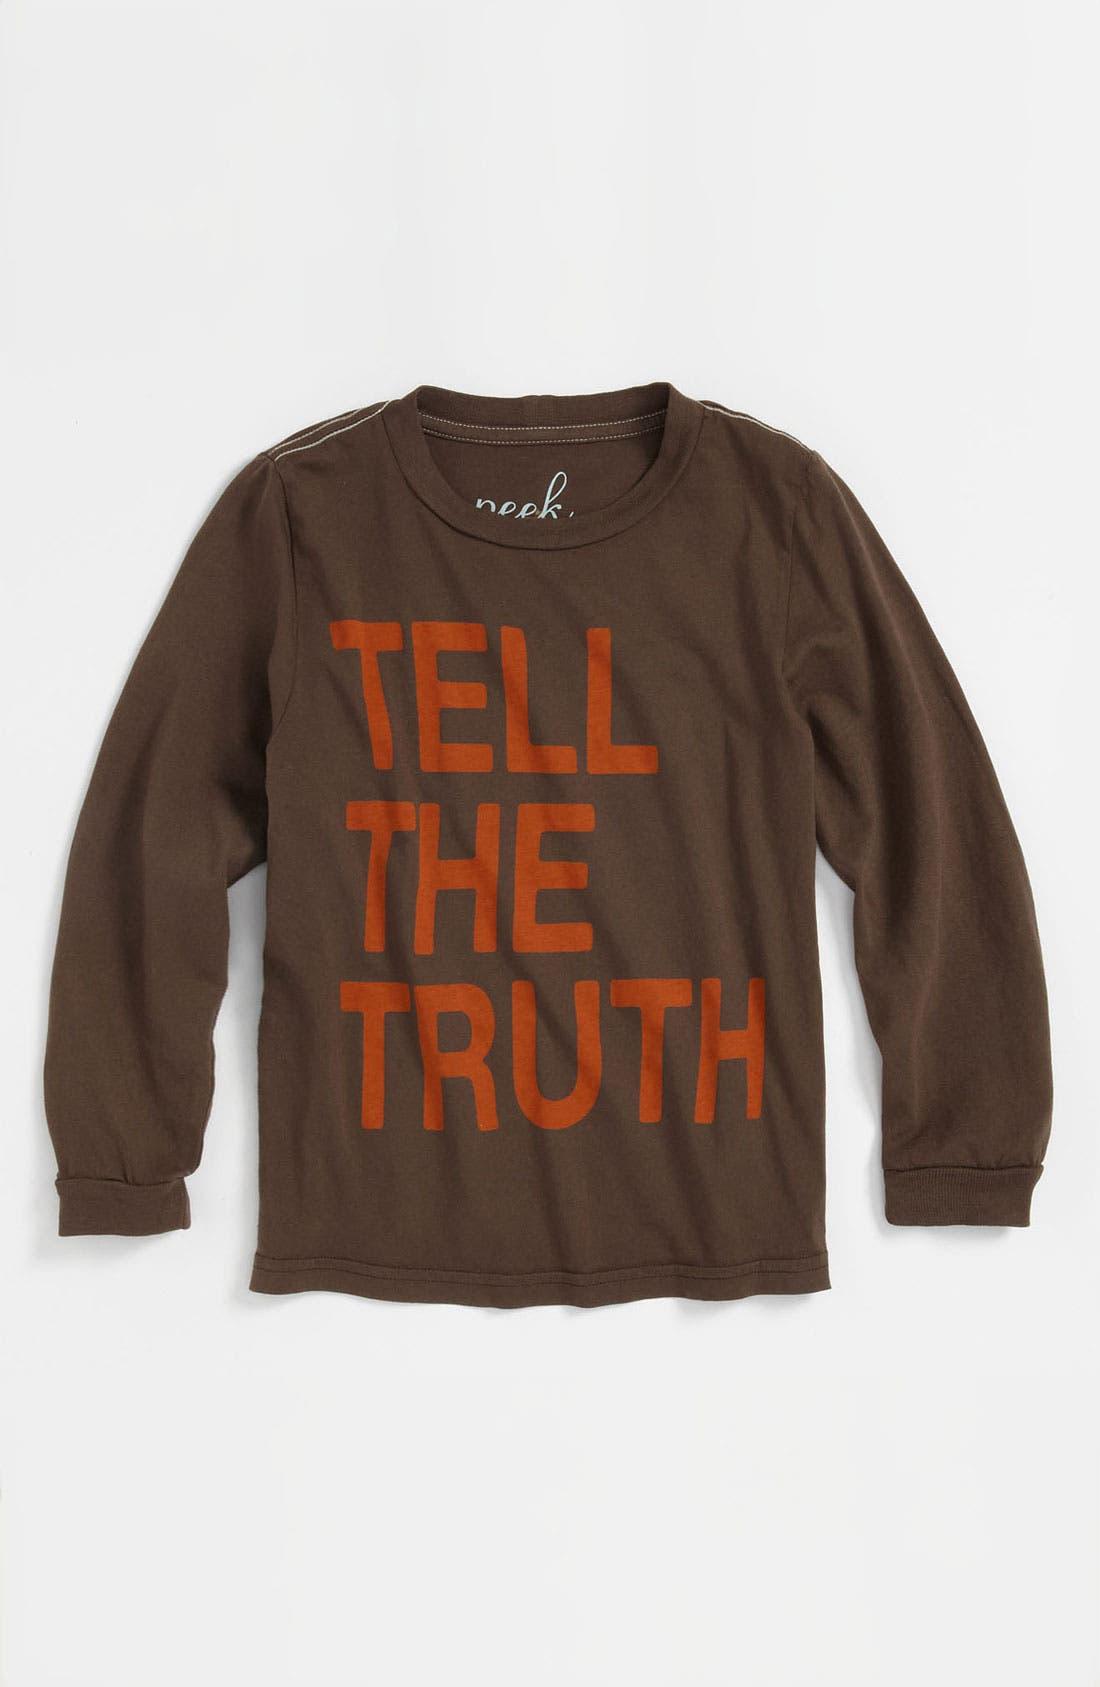 Alternate Image 1 Selected - Peek 'Tell The Truth' T-Shirt (Toddler, Little Boys & Big Boys)